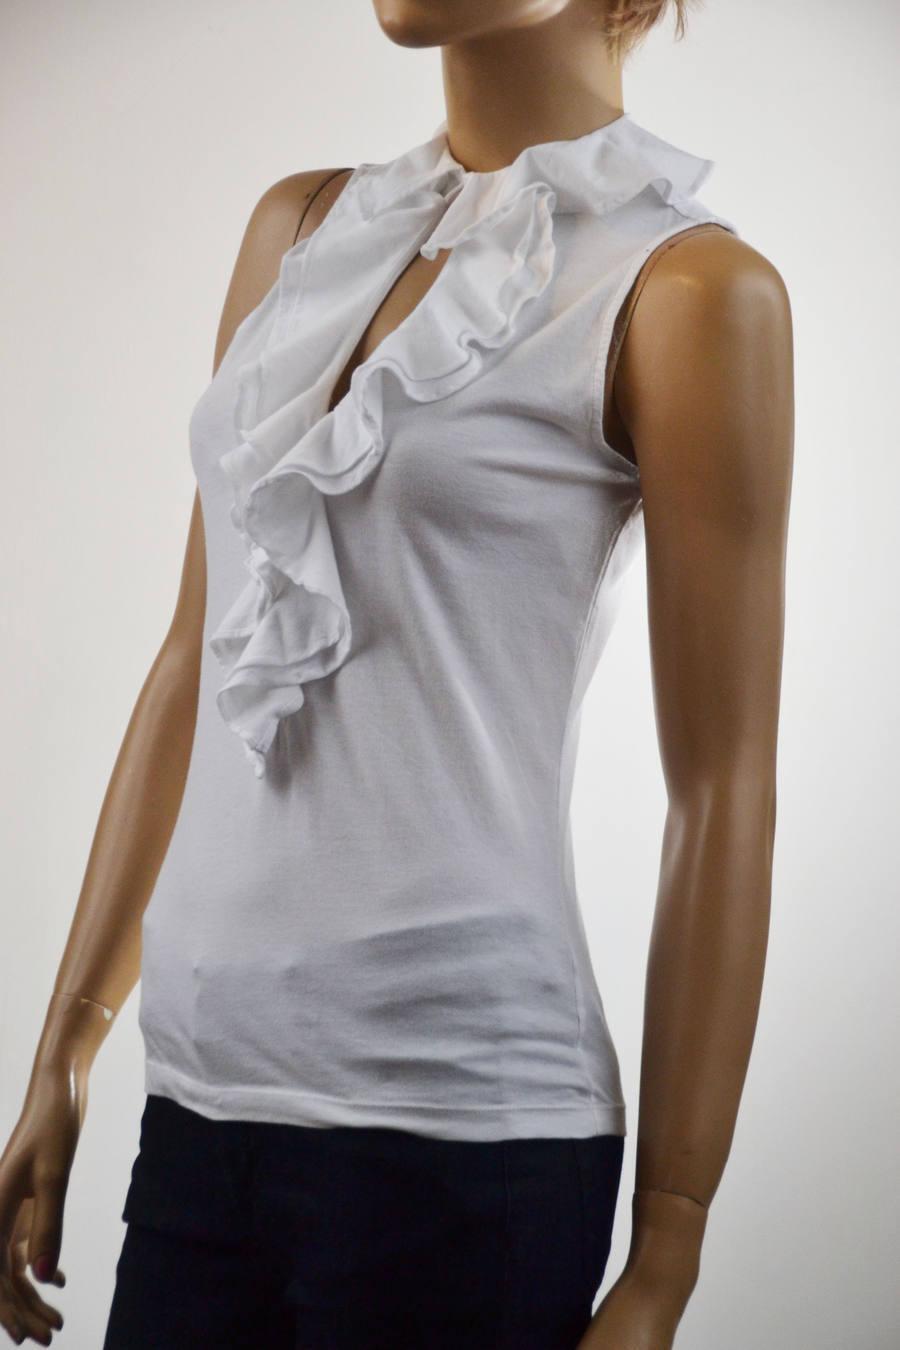 Ralph Lauren White Ruffle Cotton Knit Sleeveless Top - NWT-Retail